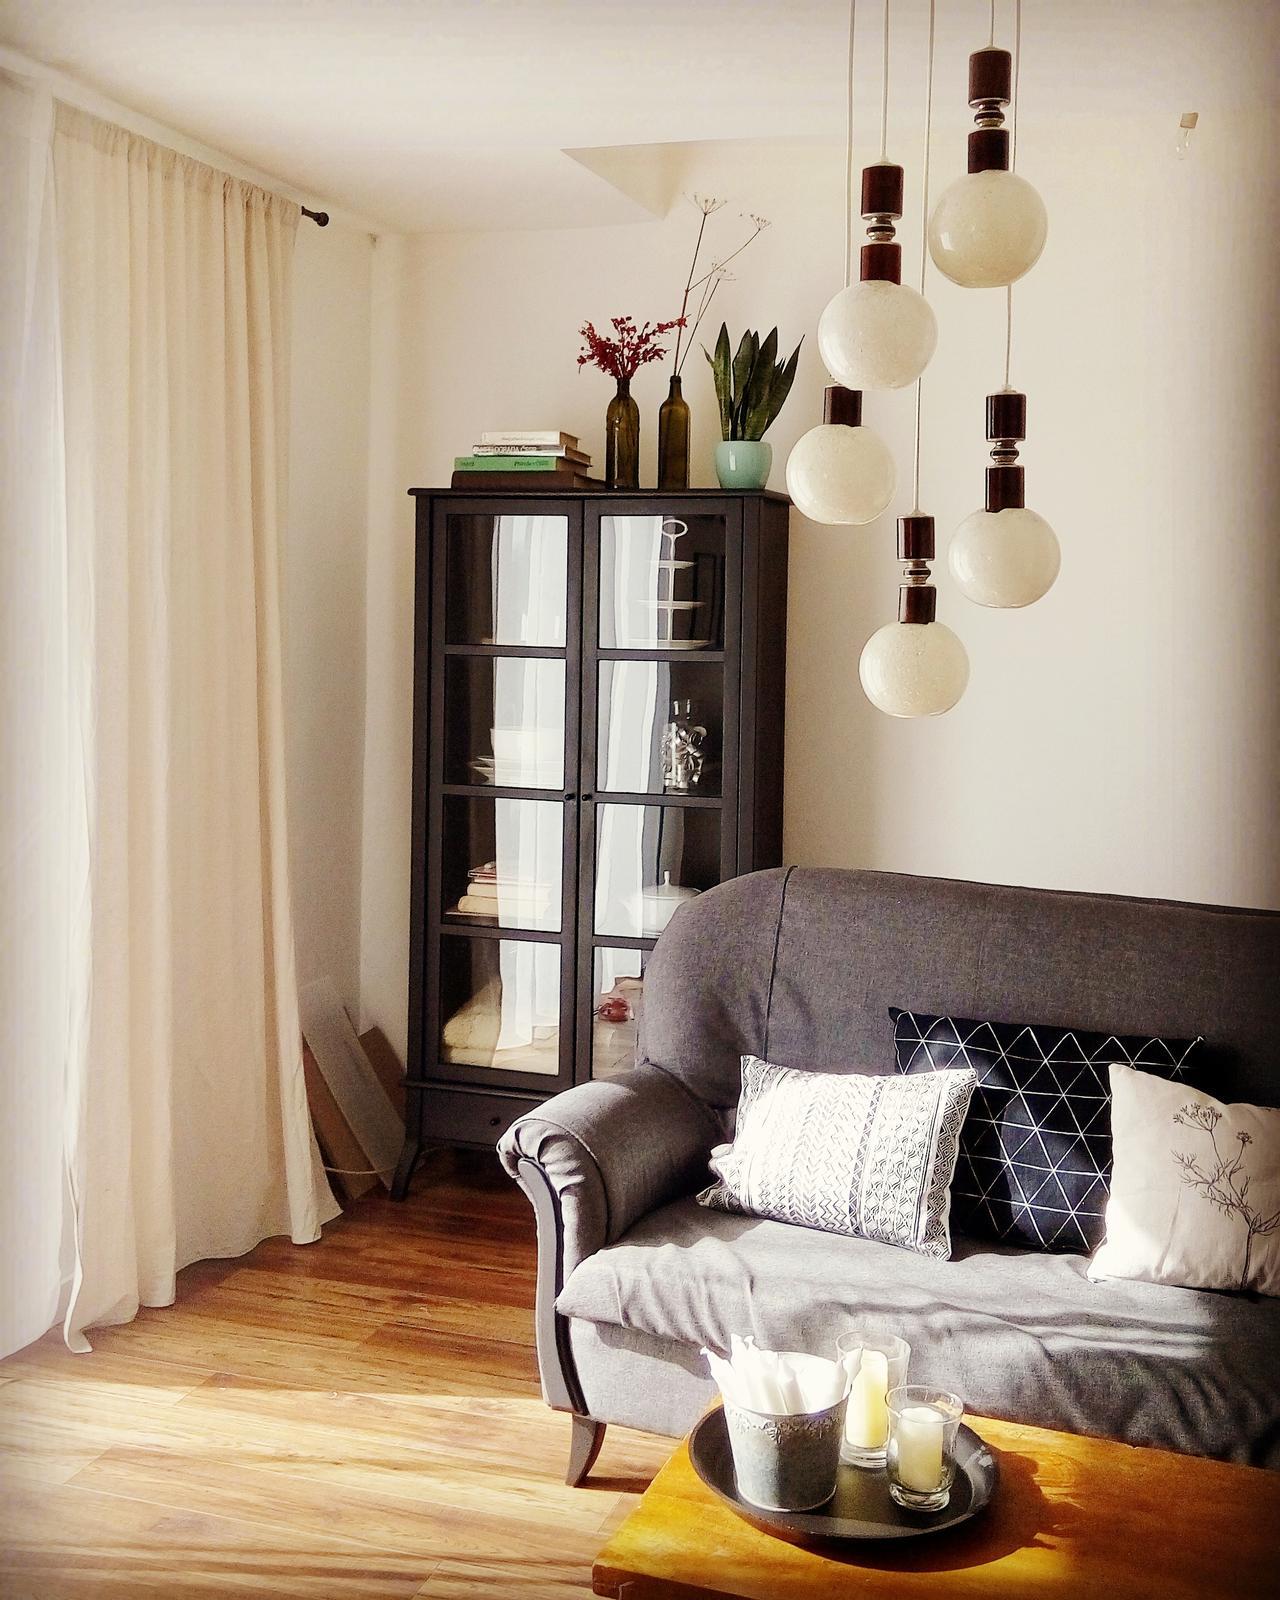 Domov - a nový luster v obyvke ;-)